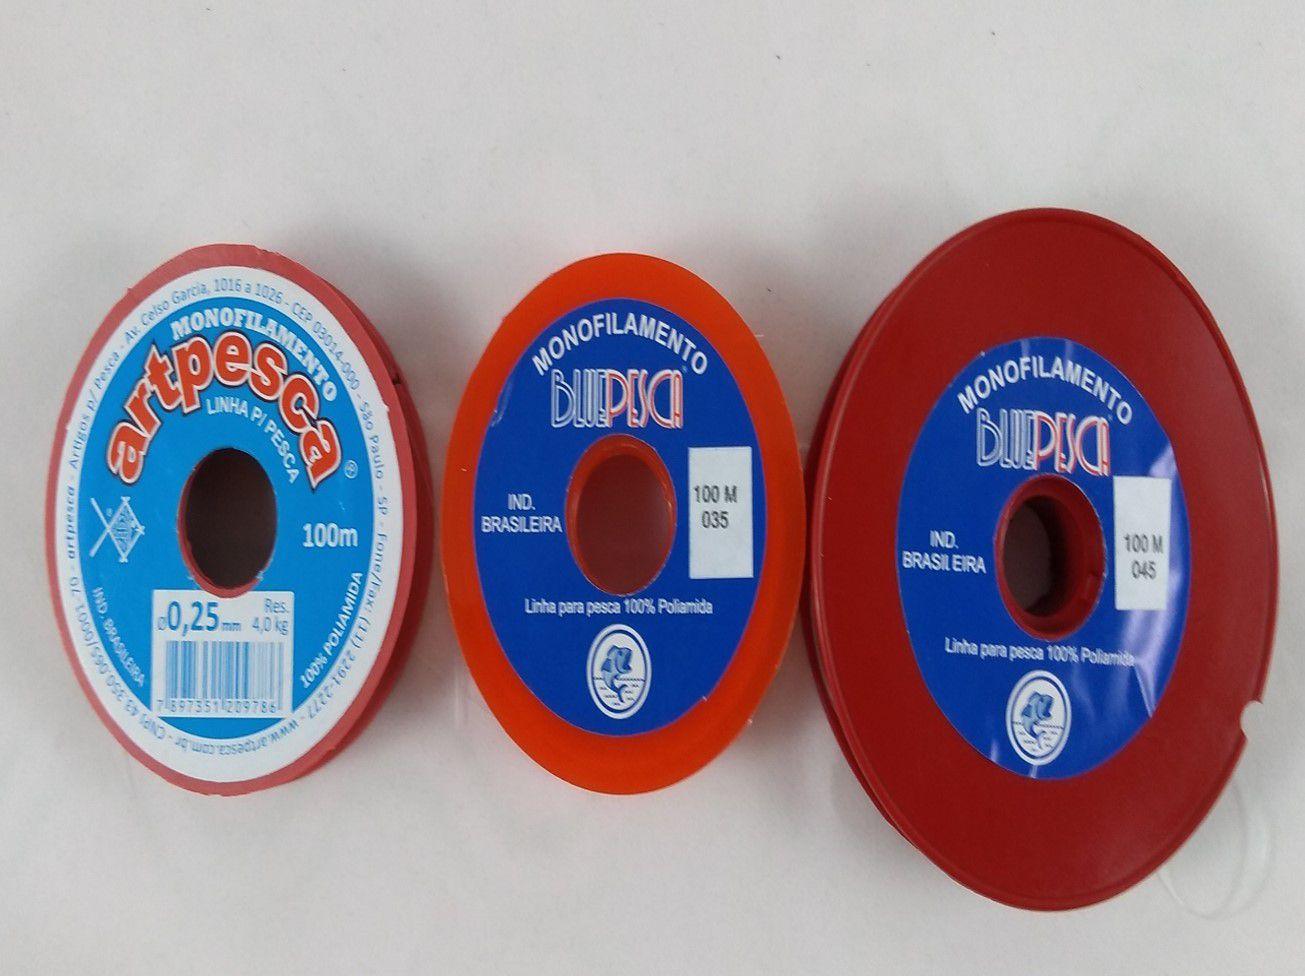 Fio de Nylon - 0,25mm  - 0,35mm - 0,45mm / 100m